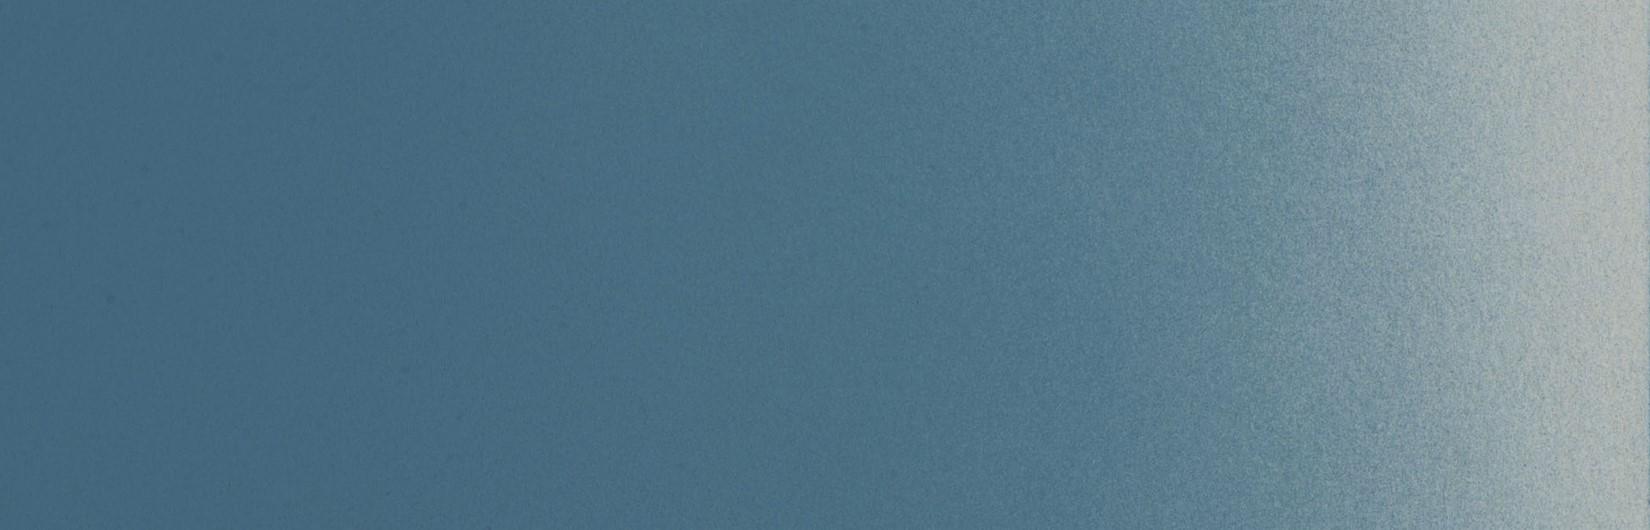 5043-createx-illustration-bloodline-expired-blue.jpg